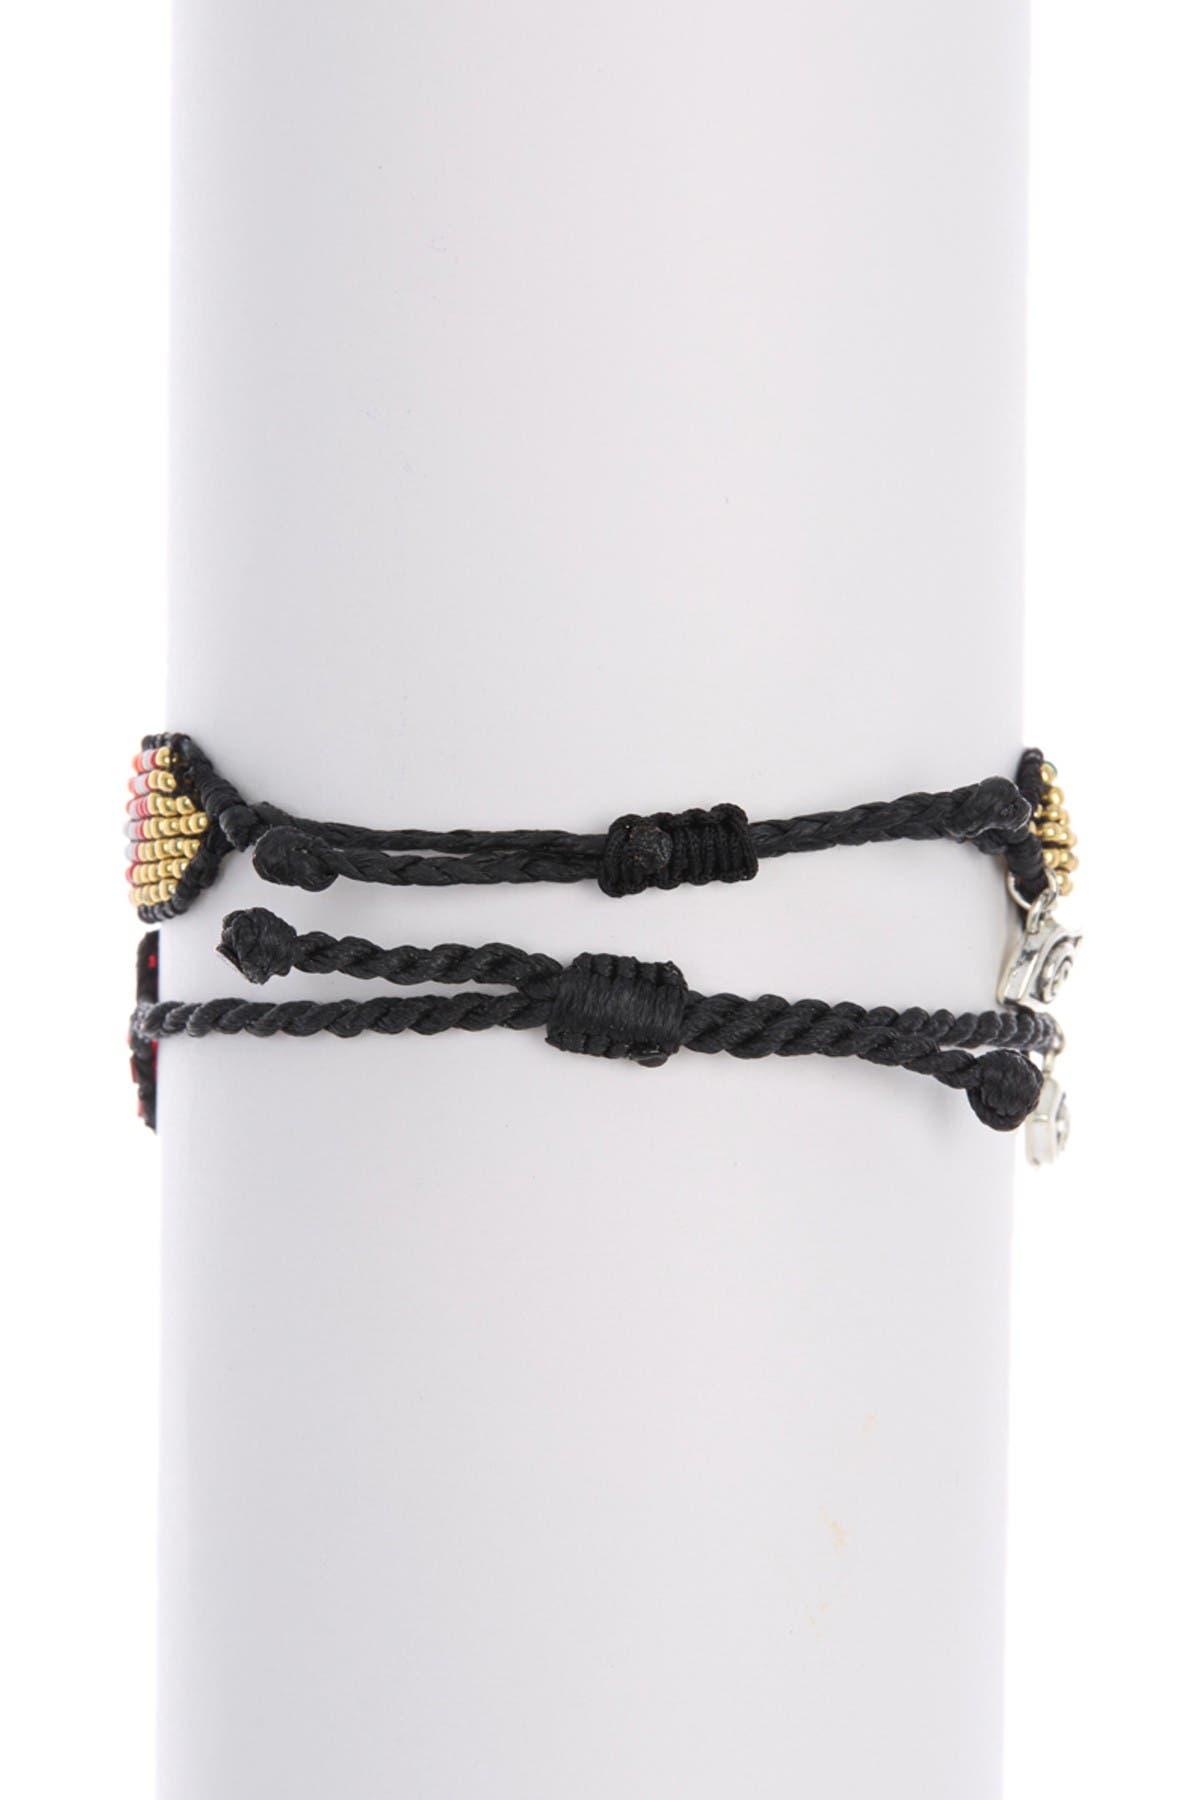 Image of AYOUNIK Spring Beaded Friendship Bracelet Set